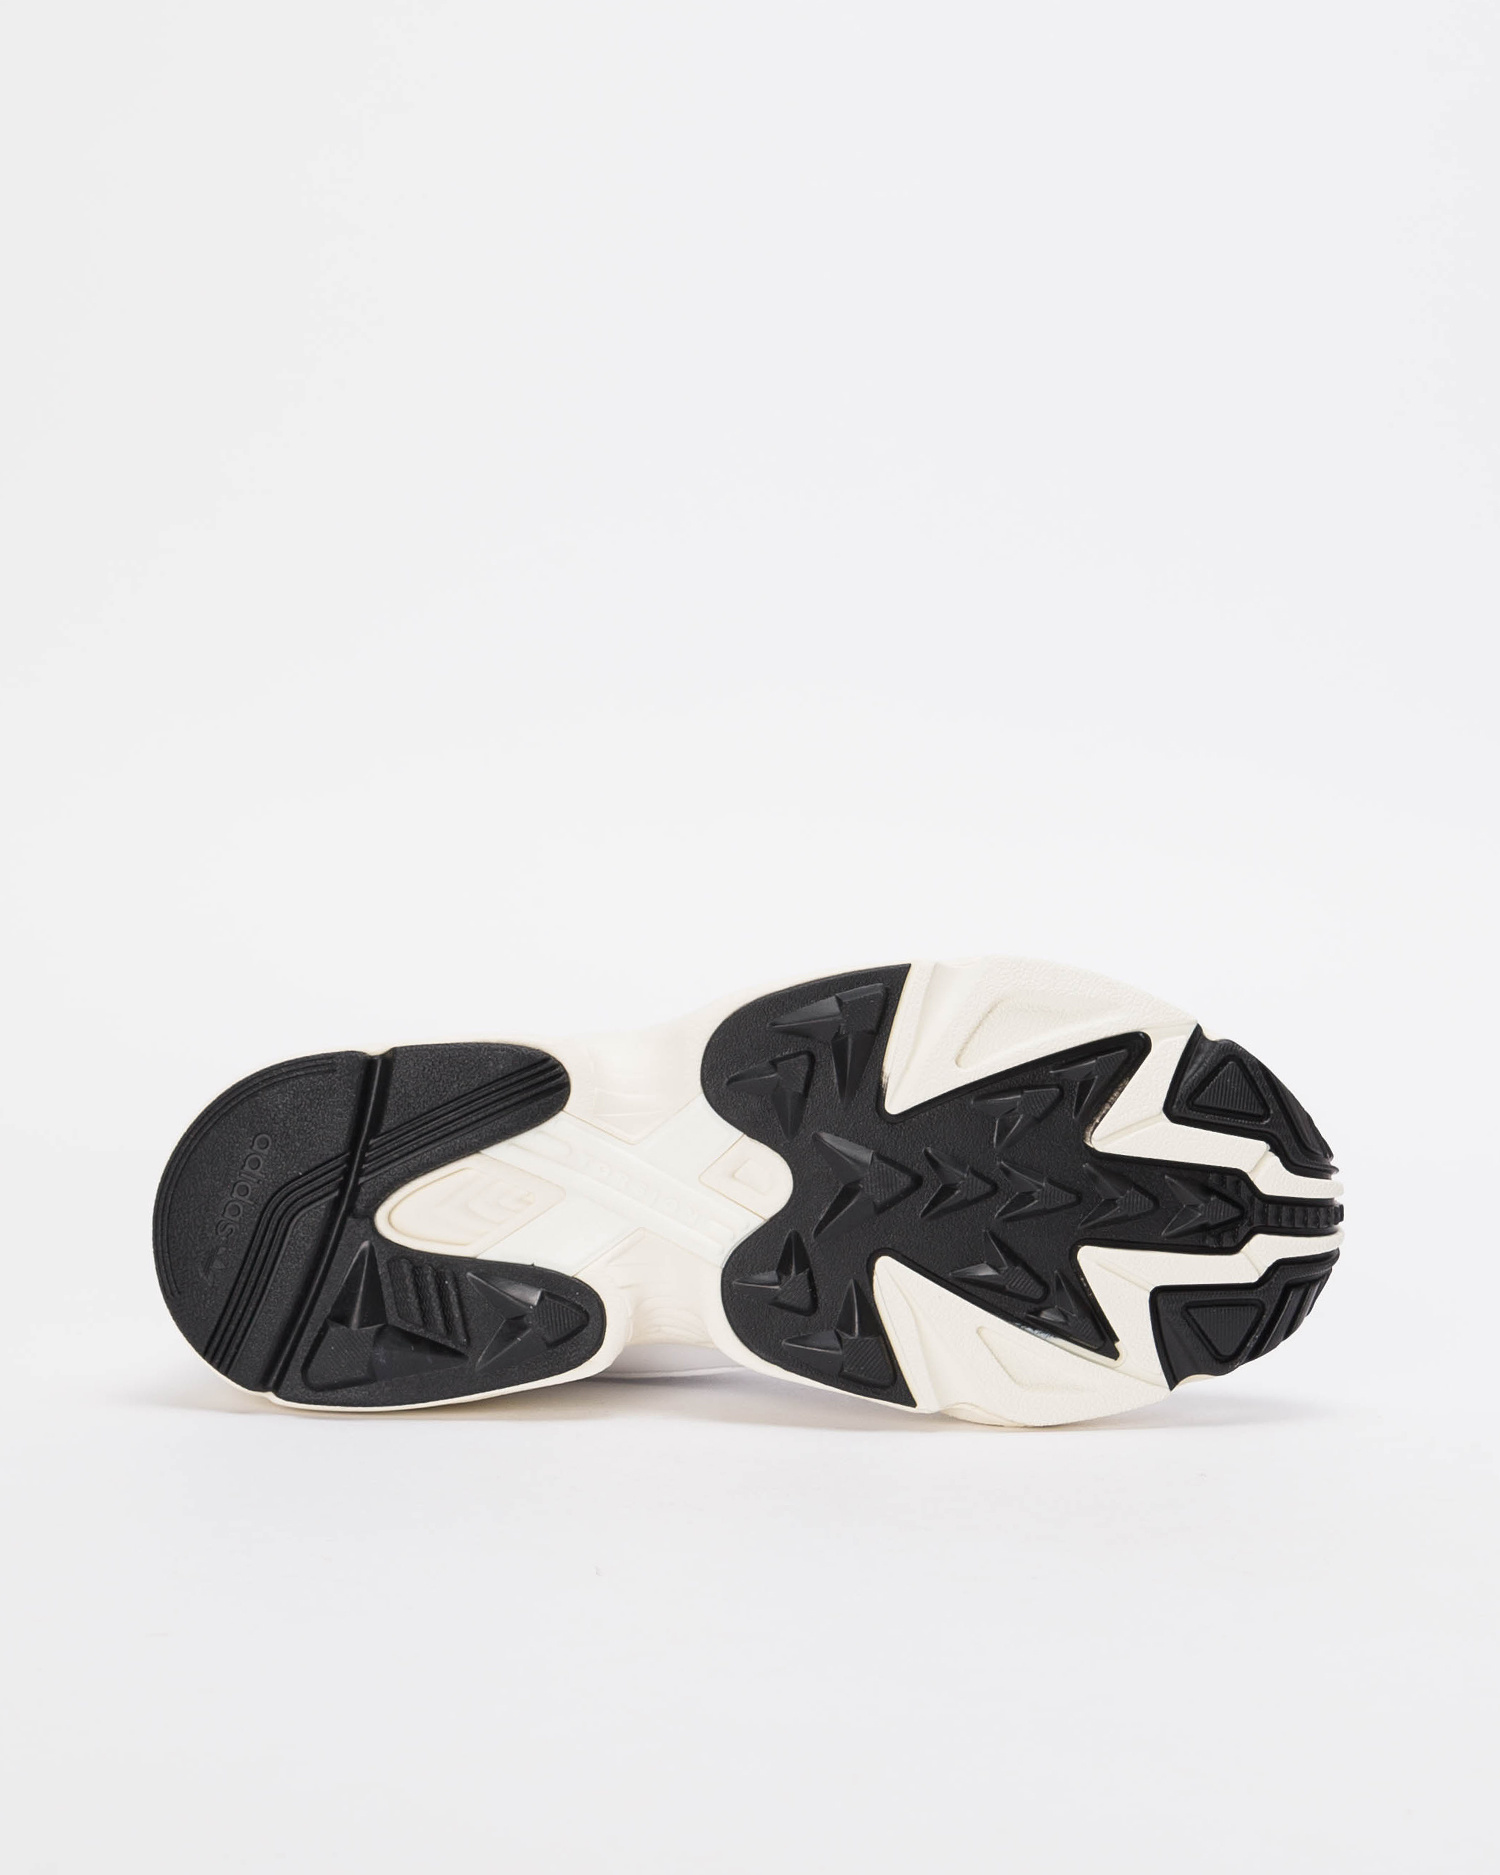 Adidas falcon allluxe w    ftwwht/ftwwht/owhite